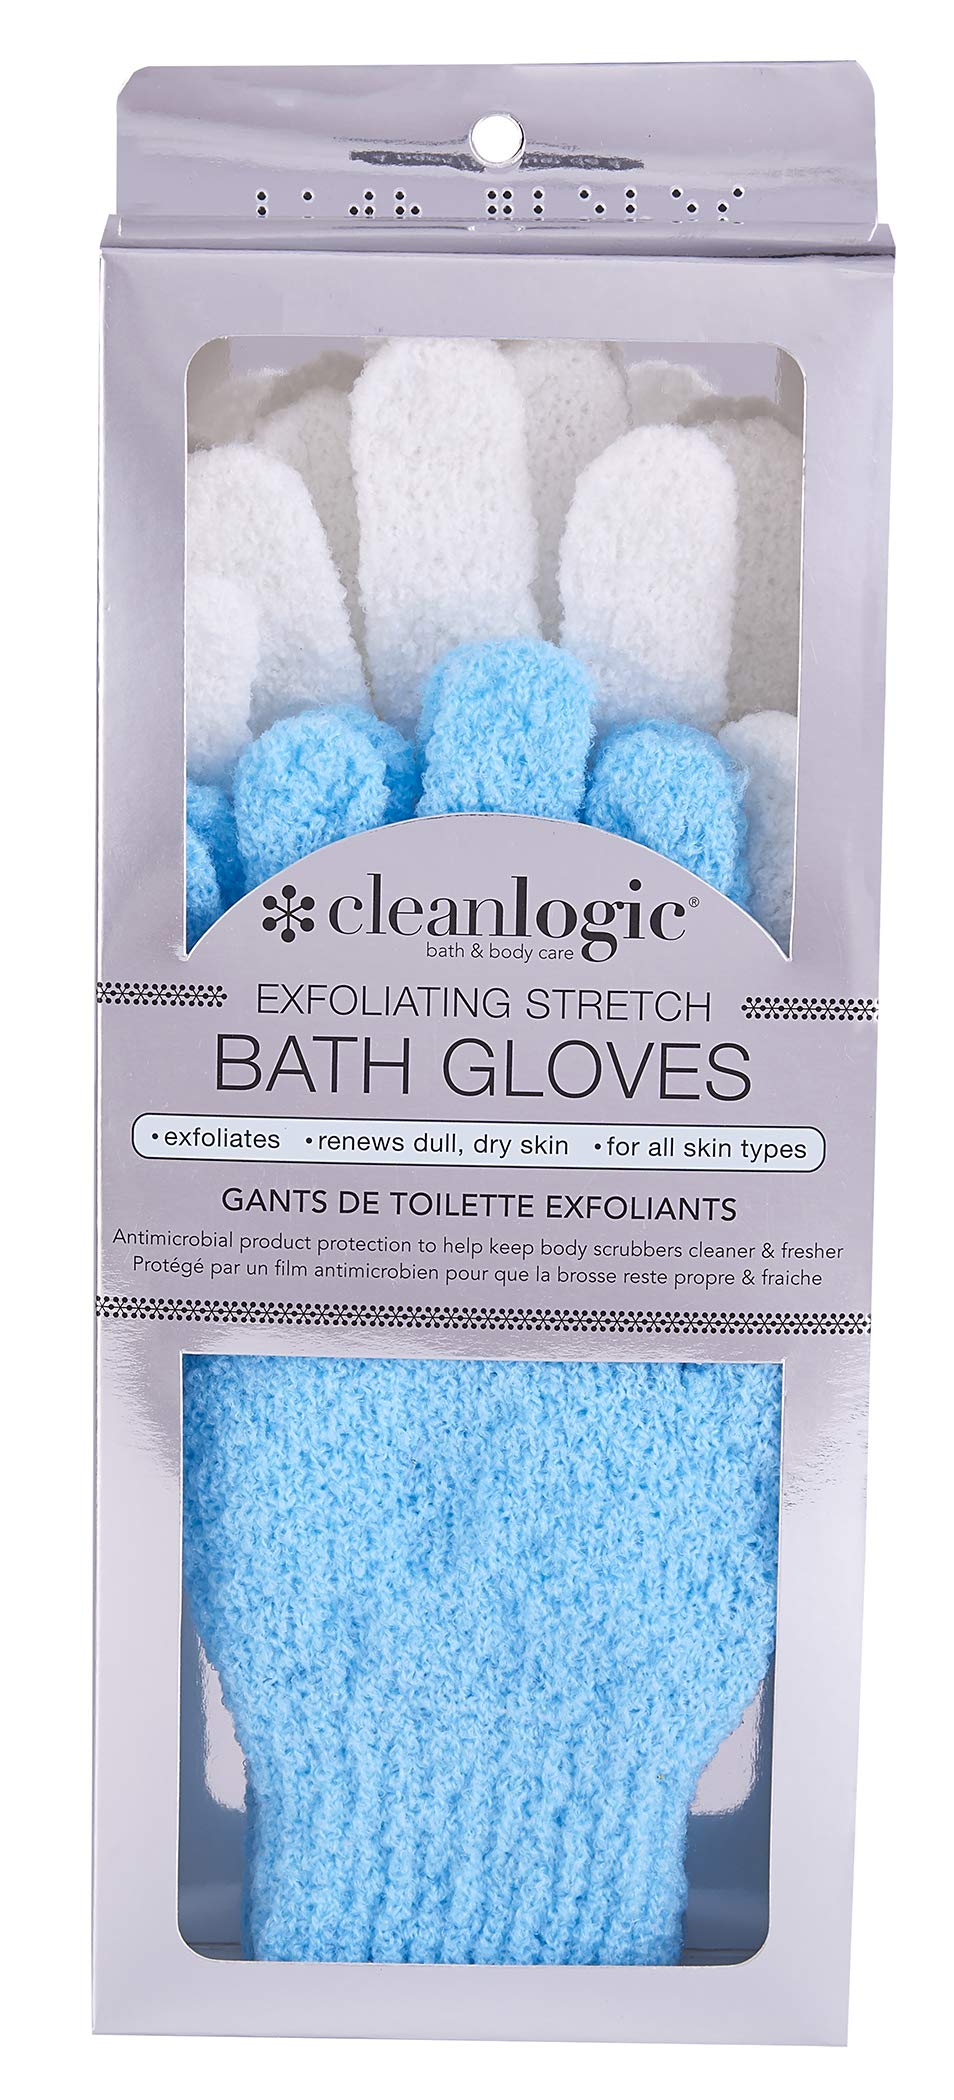 Cleanlogic Exfoliating Stretch Shower Gloves